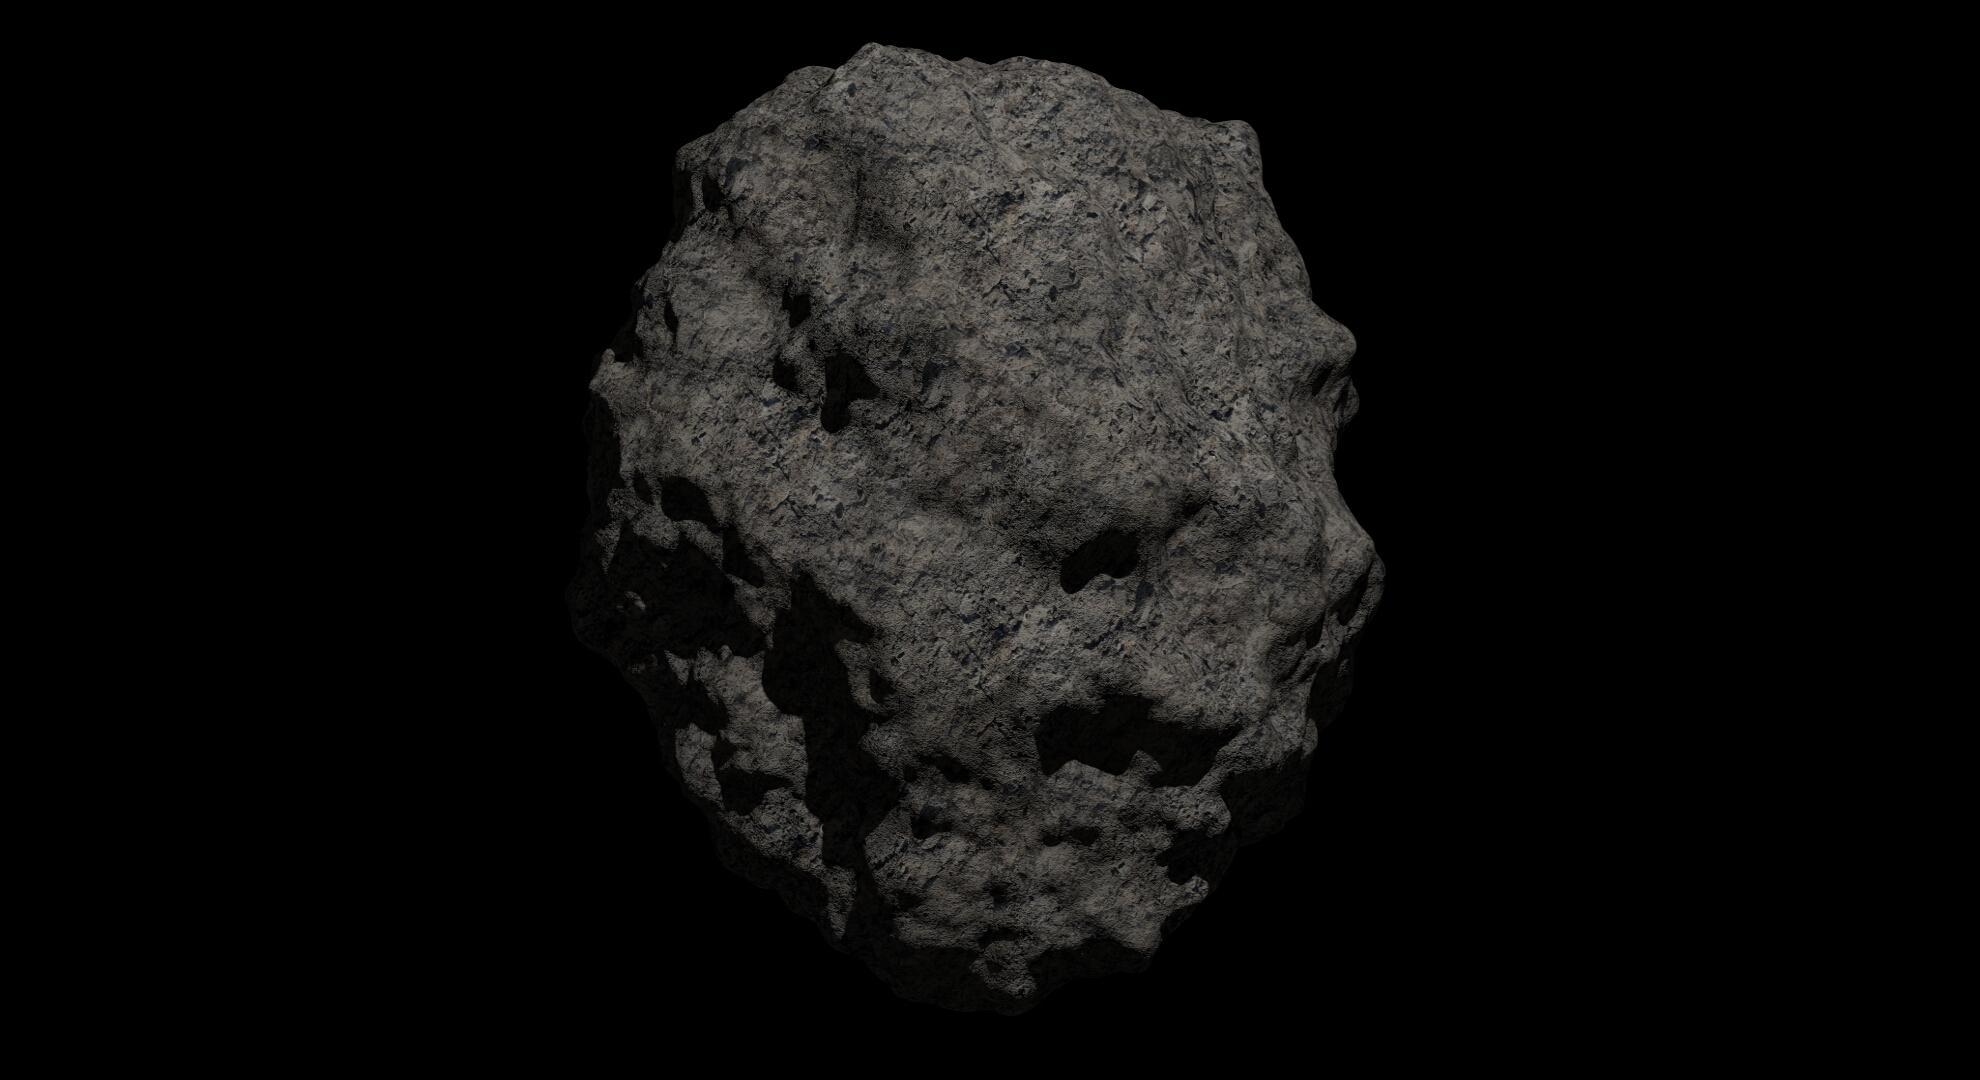 fantasy asteroid 2 3d model 3ds blend dae fbx obj 267196